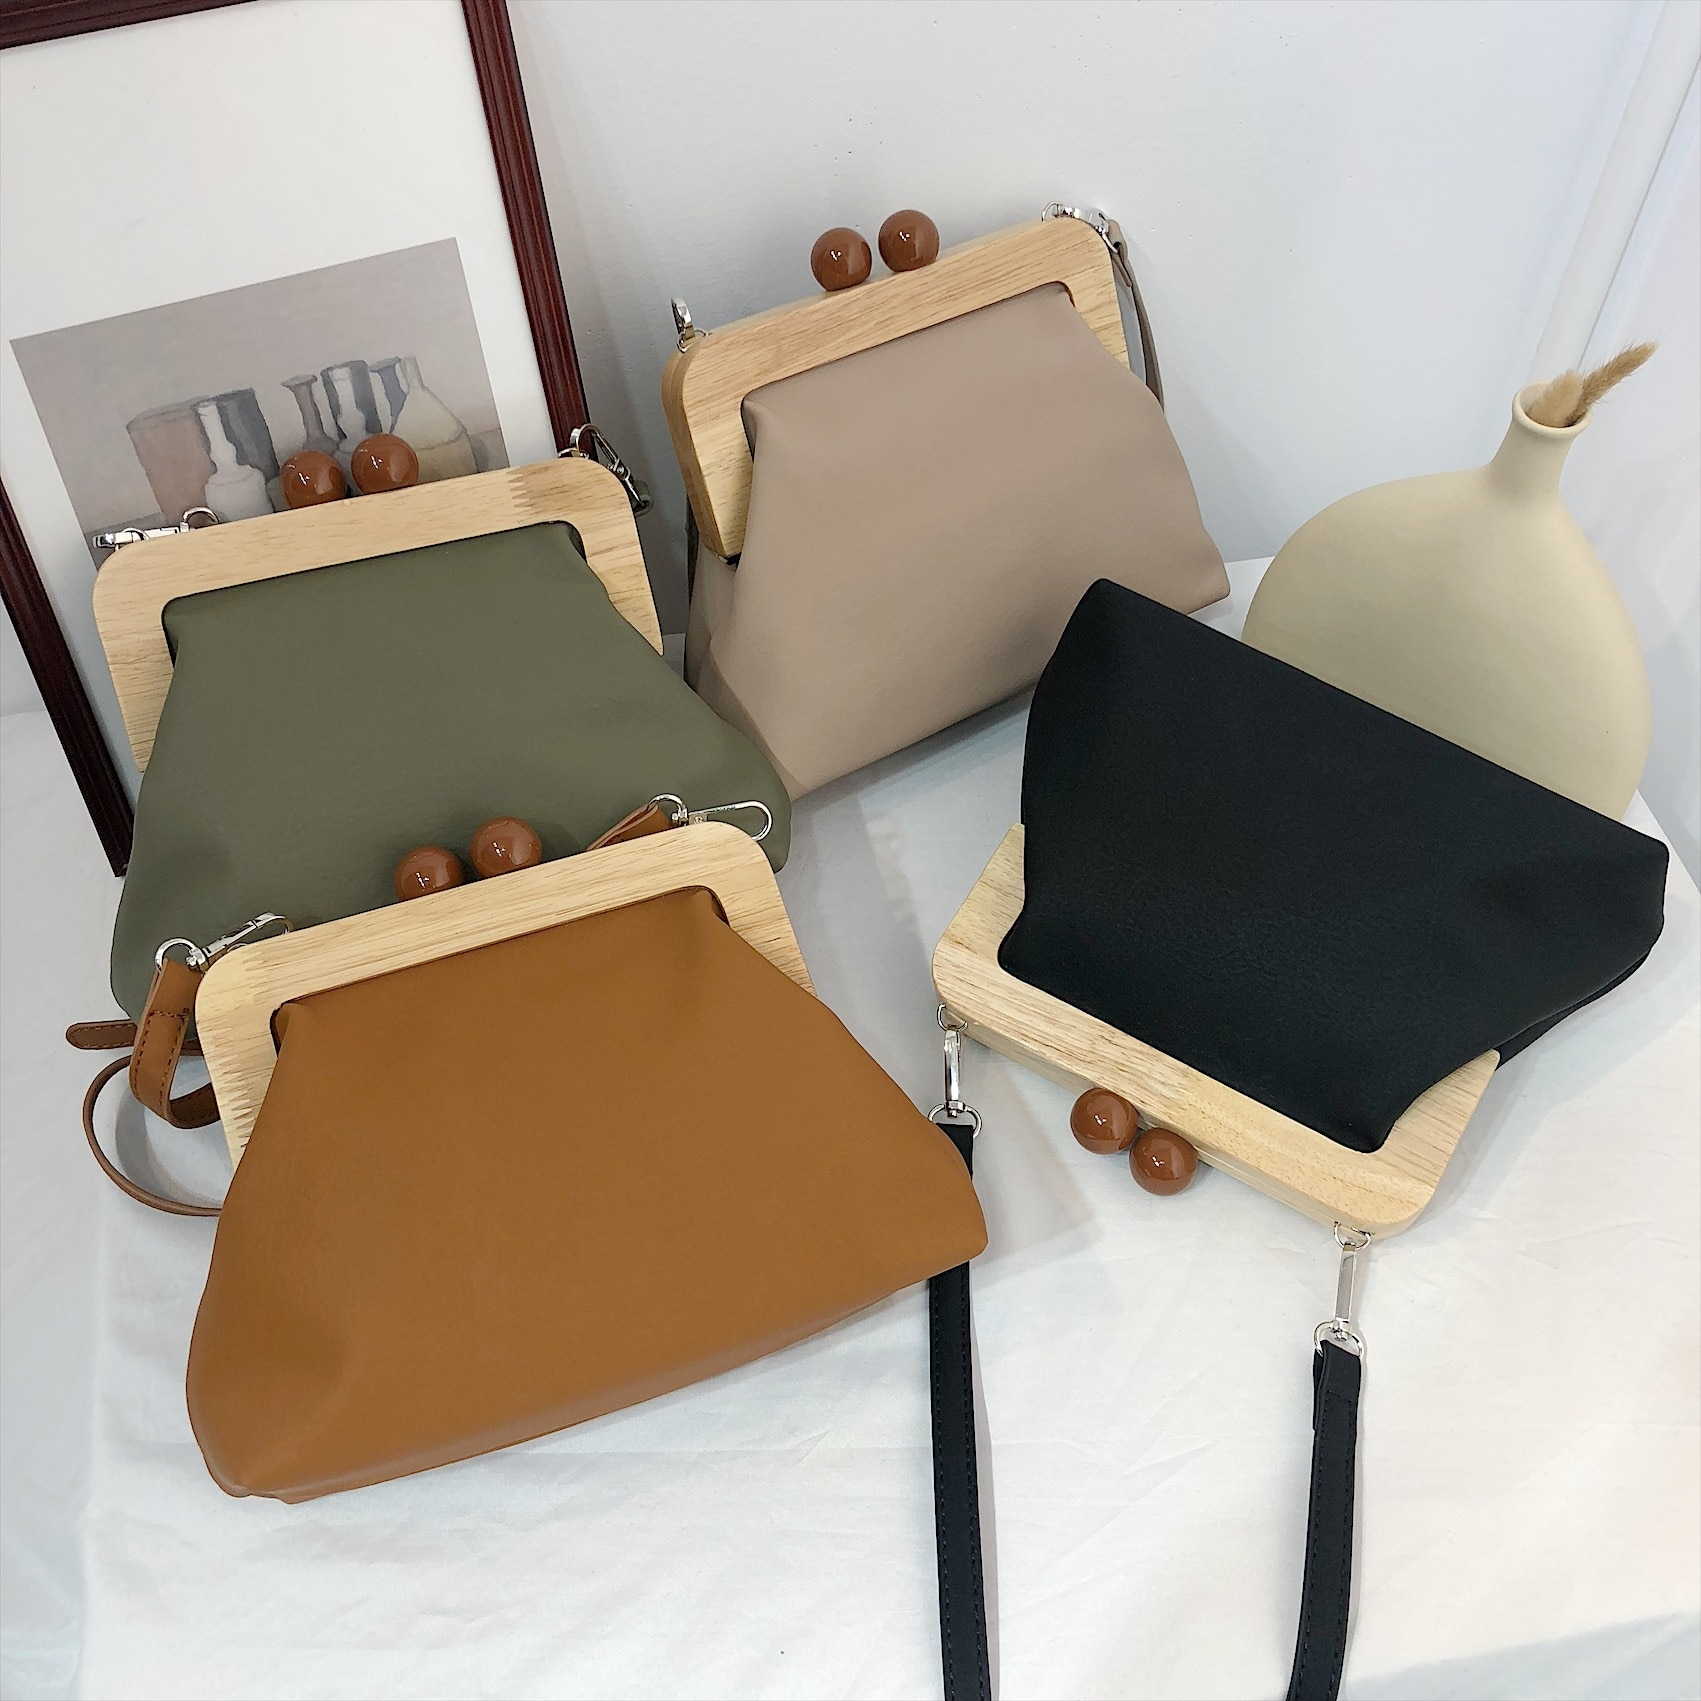 New Fashion Women Handbag Retro Chic Soft PU Leather Wood Clip Bag Dinner Clutch Purse Lady Luxury Shoulder Messenger Bag